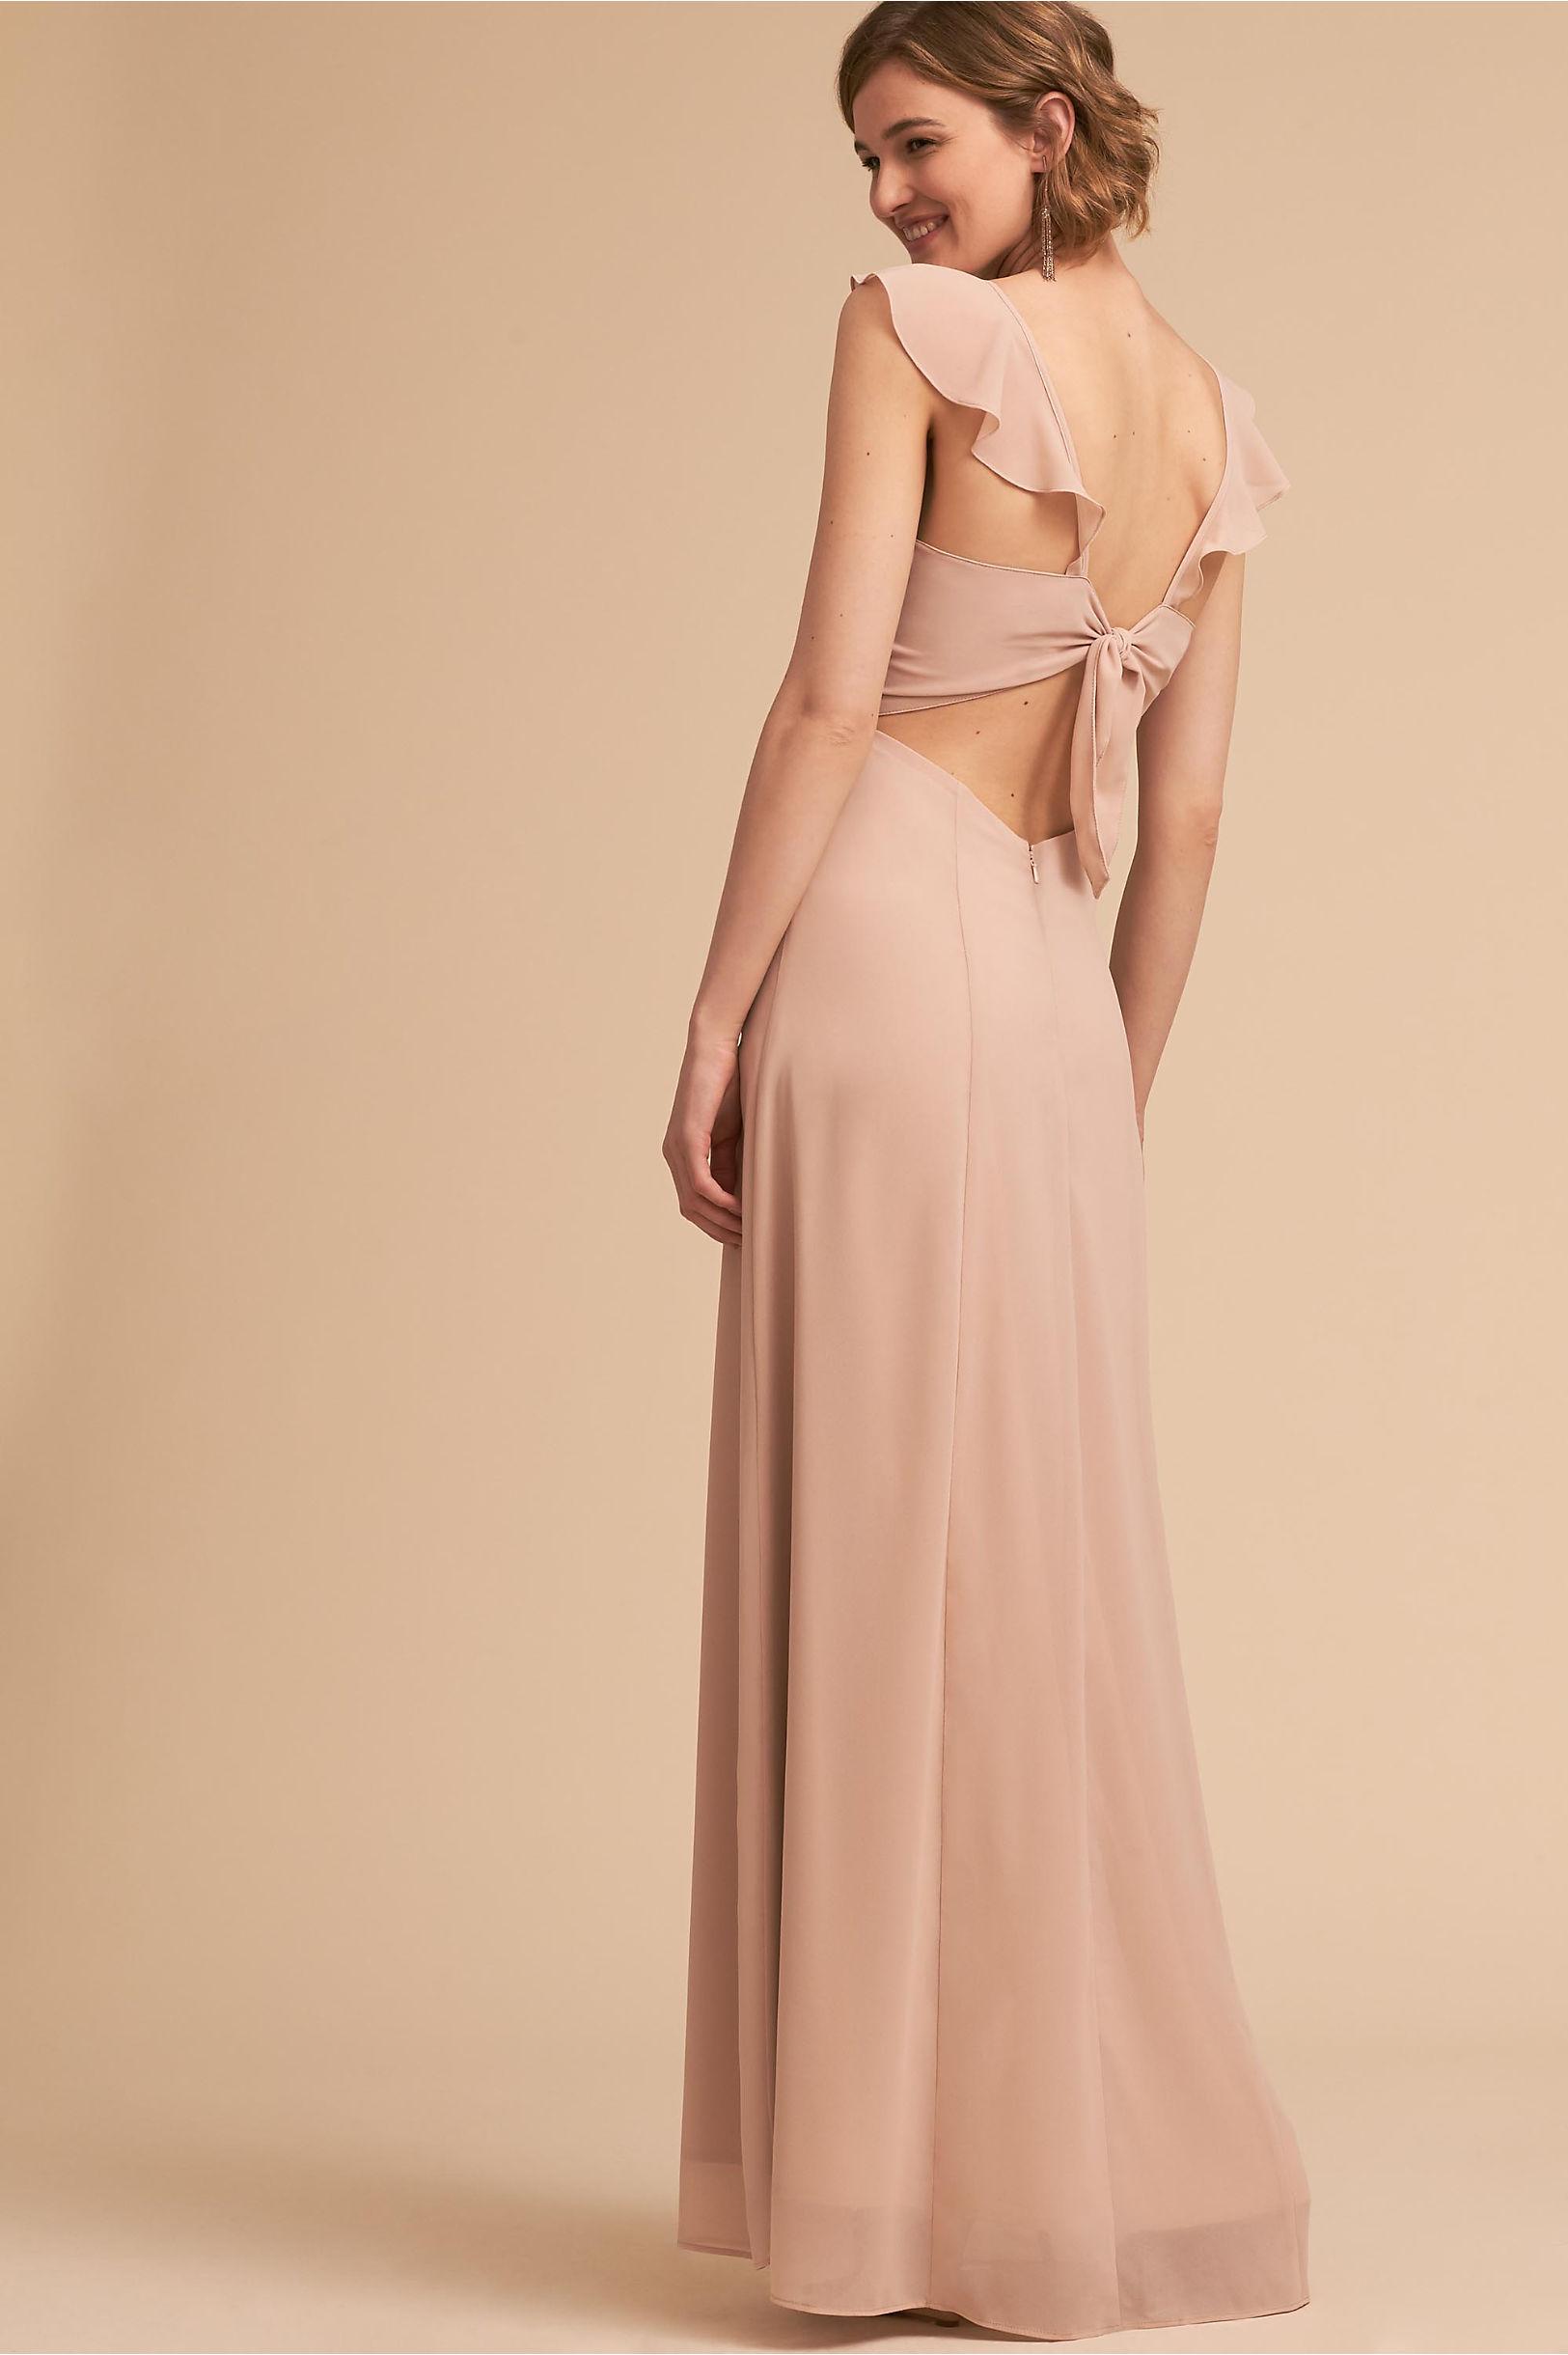 Affordable Bridesmaid Dresses Under 200 | BHLDN